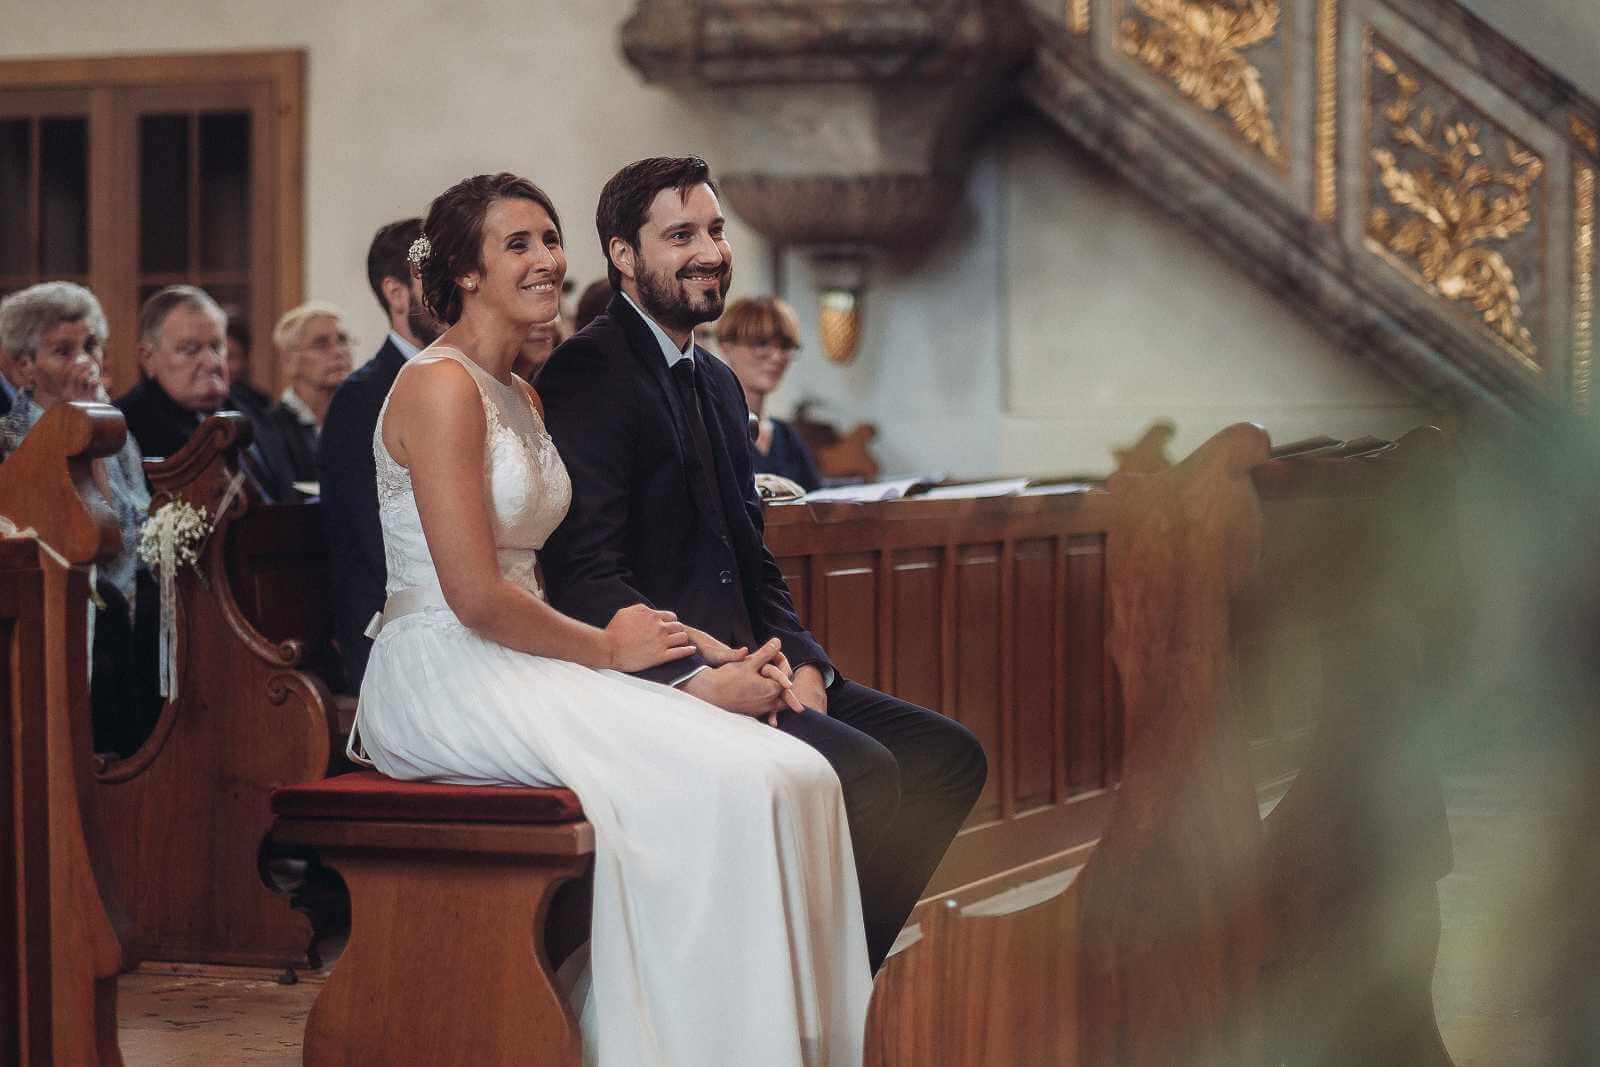 Hochzeitsfotograf Offenburg Zell am Harmersbach Bärenkeller (40)